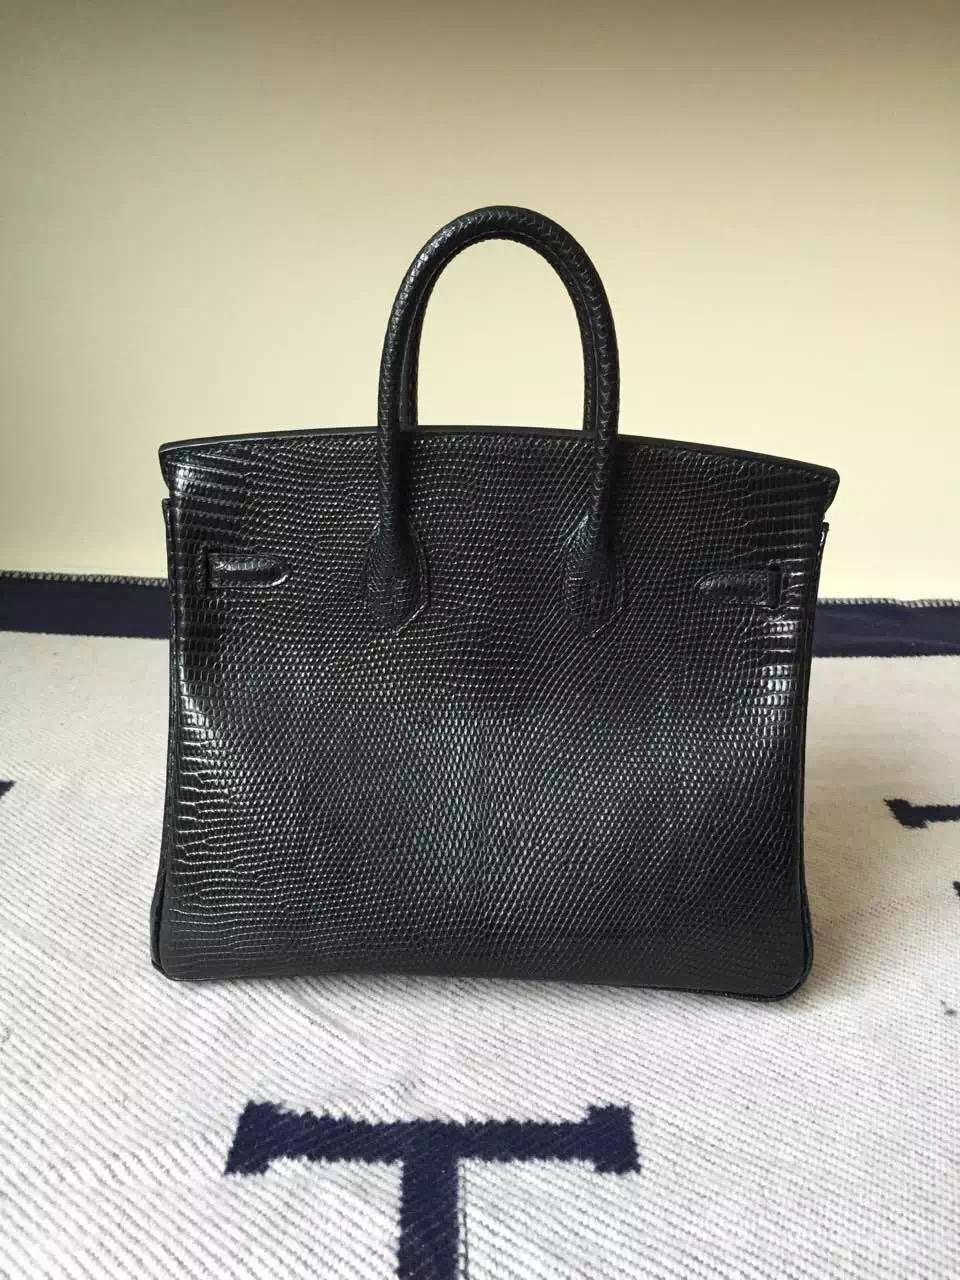 New Noble Hermes CK89 Black Lizard Leather Birkin Bag 25cm